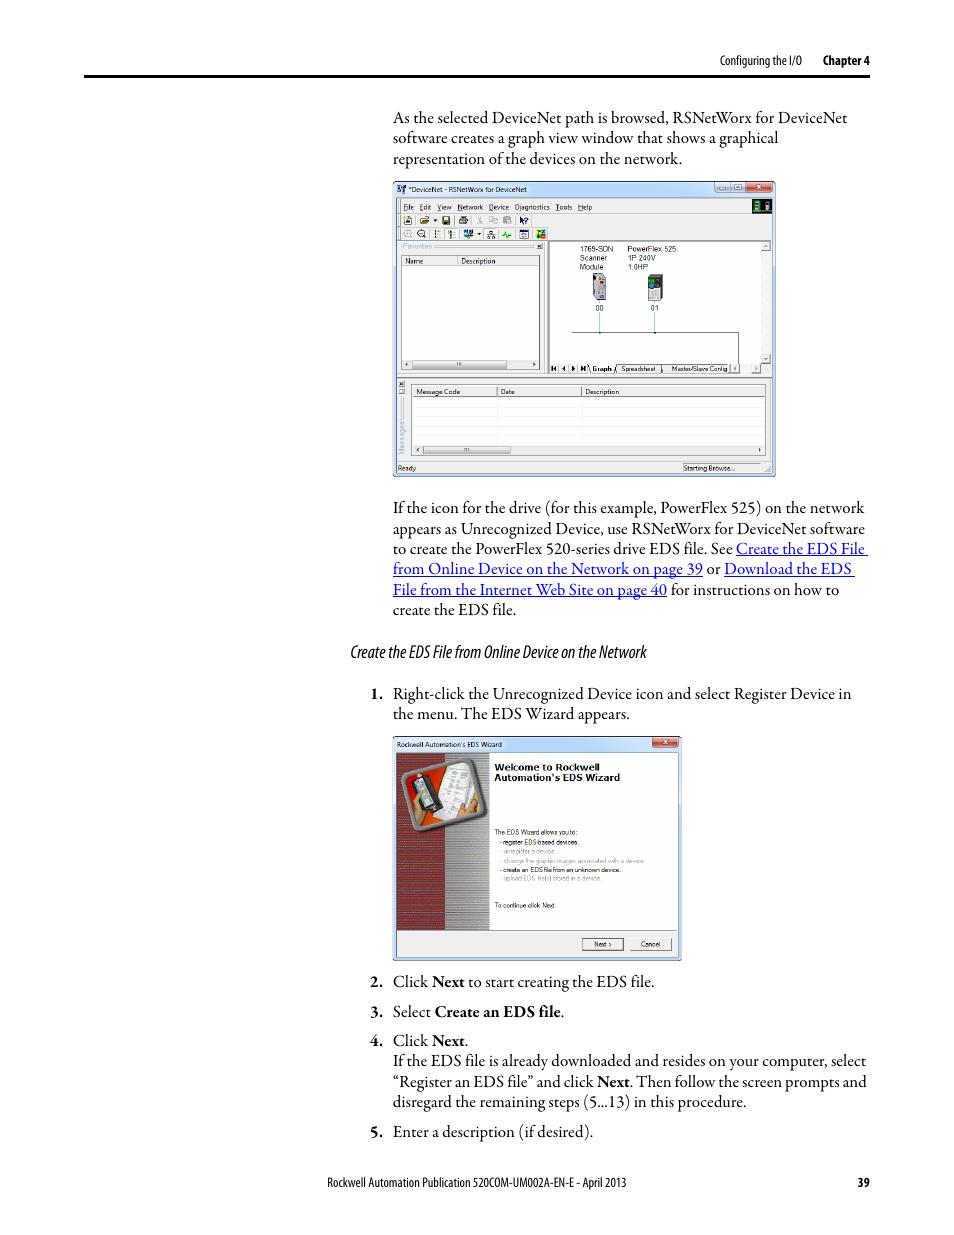 Devicenet Manual 1769 Sdn Scanner Module Catalog Wiring Diagram Rockwell Automation 25 Comm D Powerflex 525